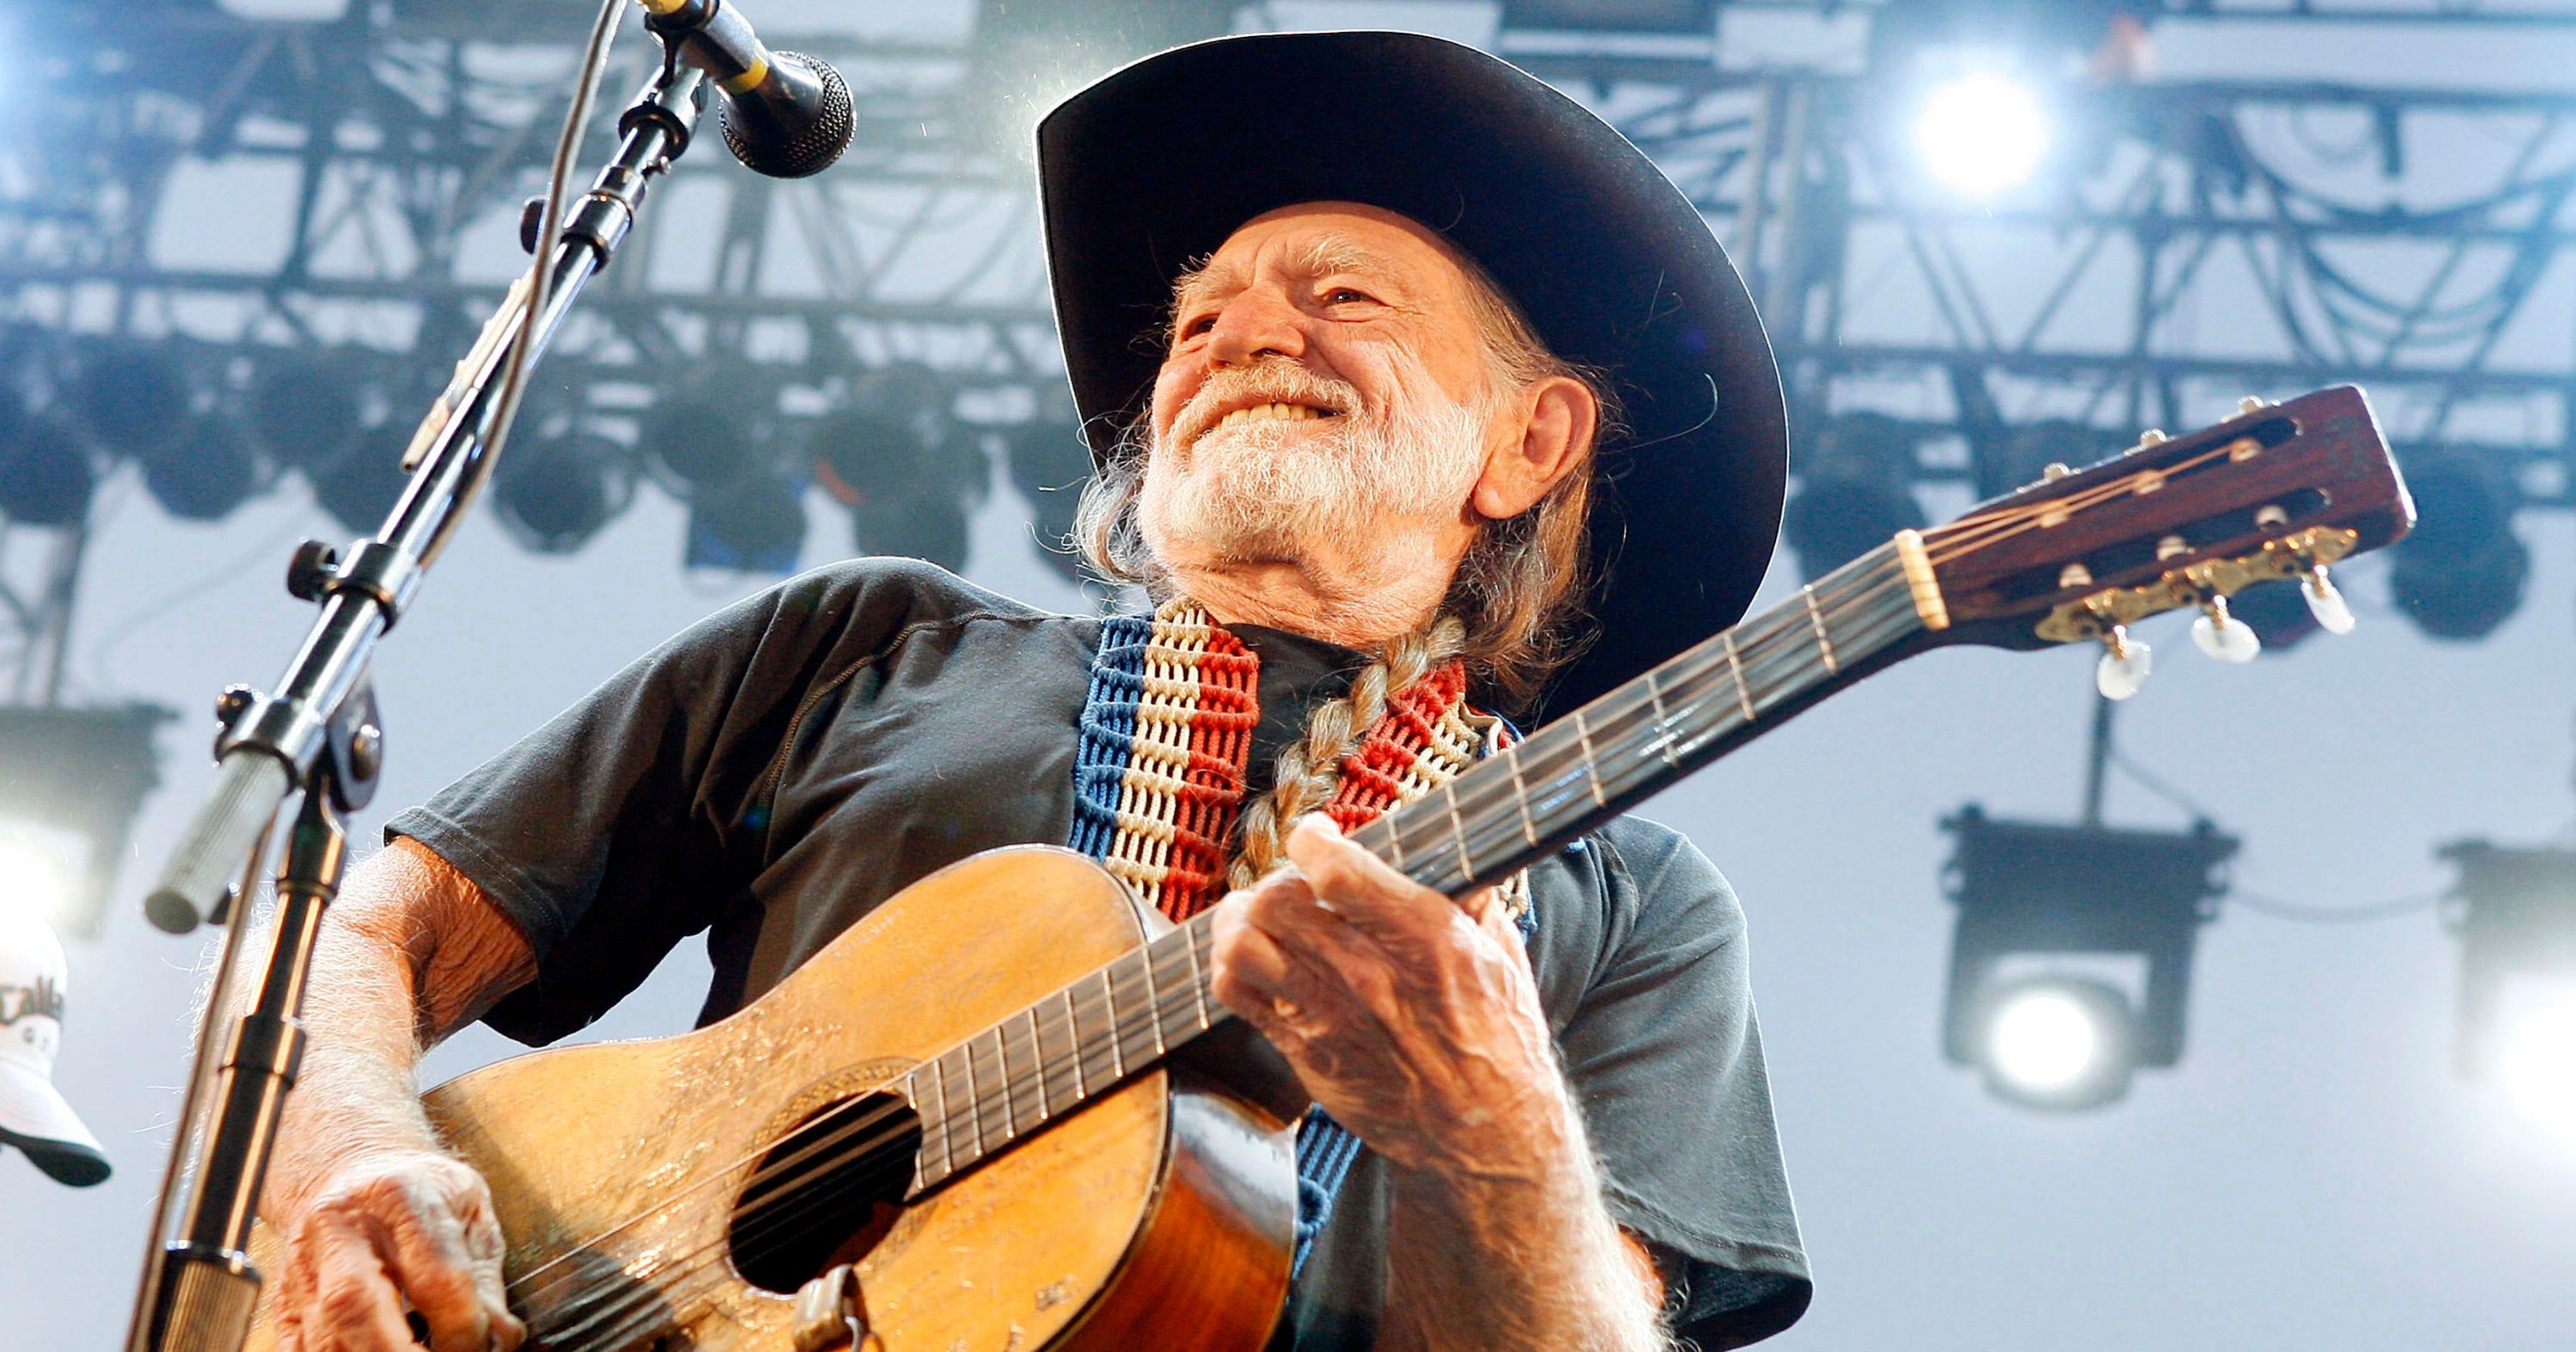 Podcast: Willie Nelson lucks into 'Trigger' guitar